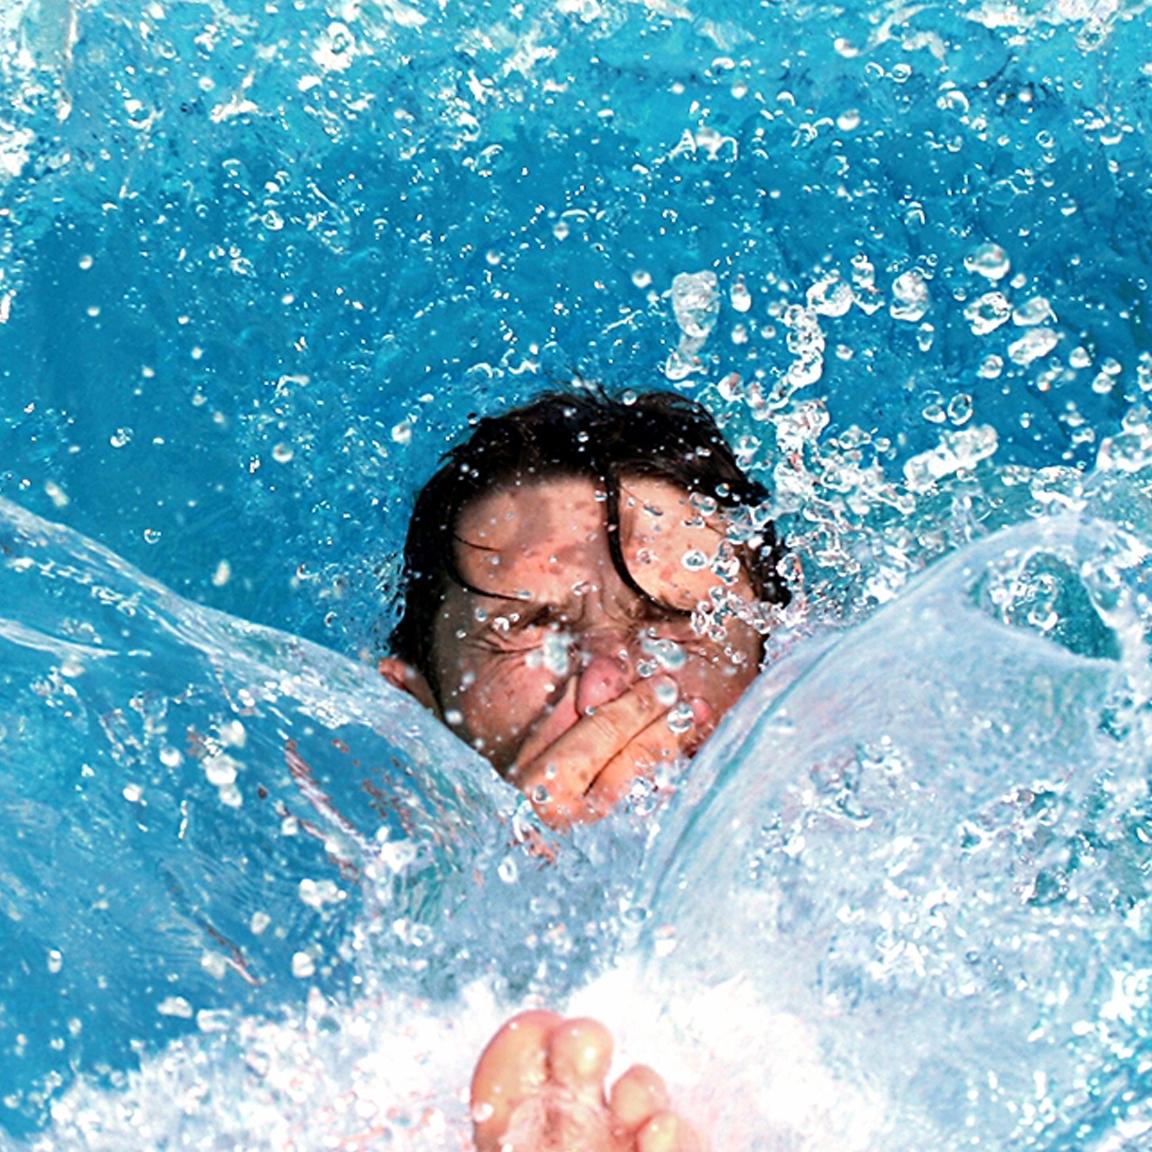 Poseidon entretien piscine spa montr al rive sud for Balayeuse de piscine